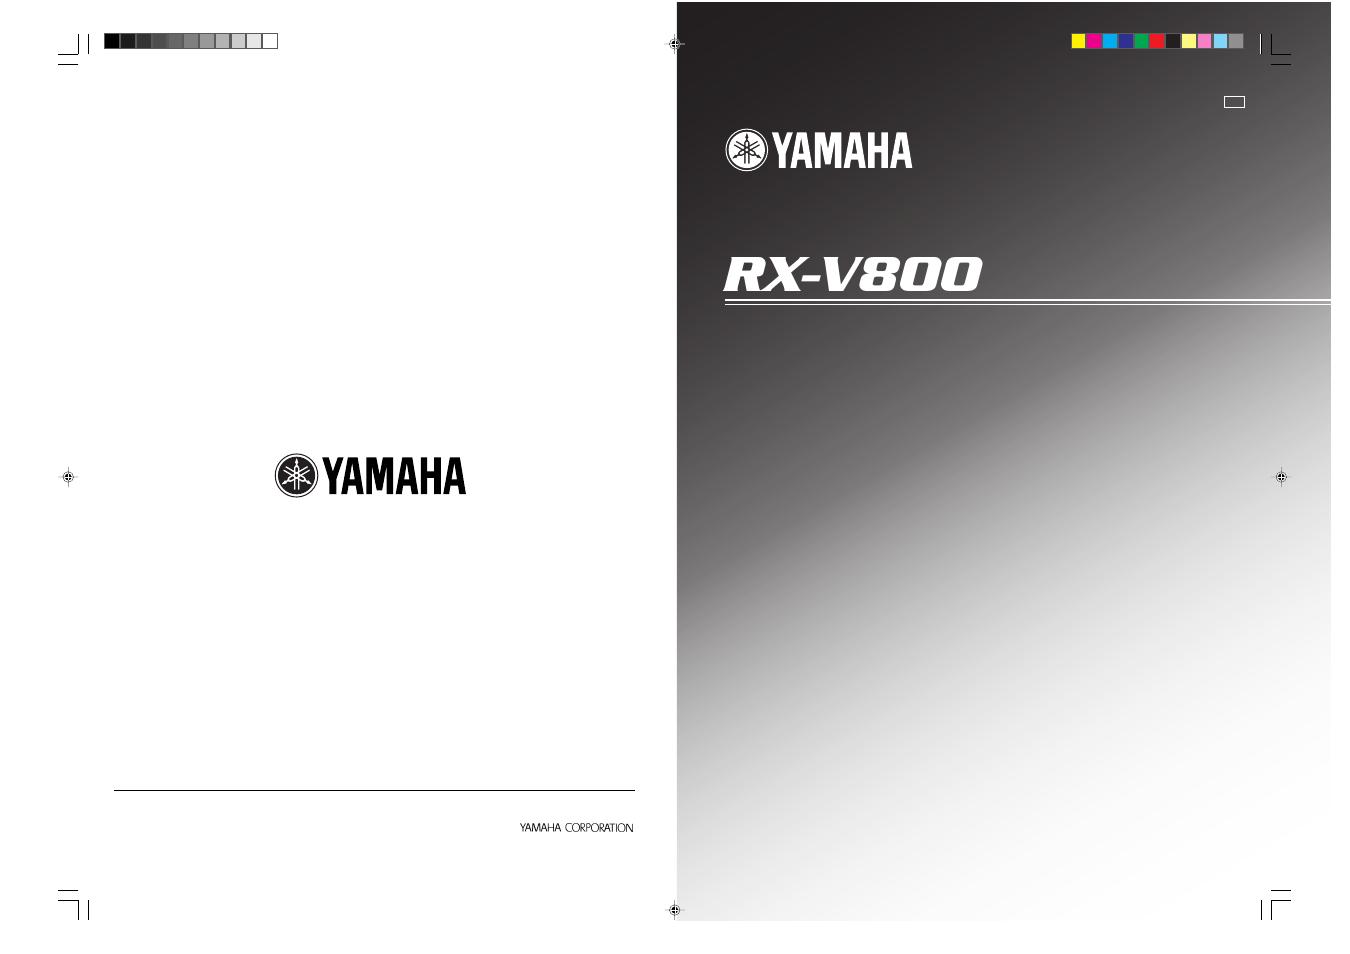 Yamaha Receiver User Manuals Block Diagram Canonir5000 Rx 530 Stereo Array V800 Manual 82 Pages Rh Manualsdir